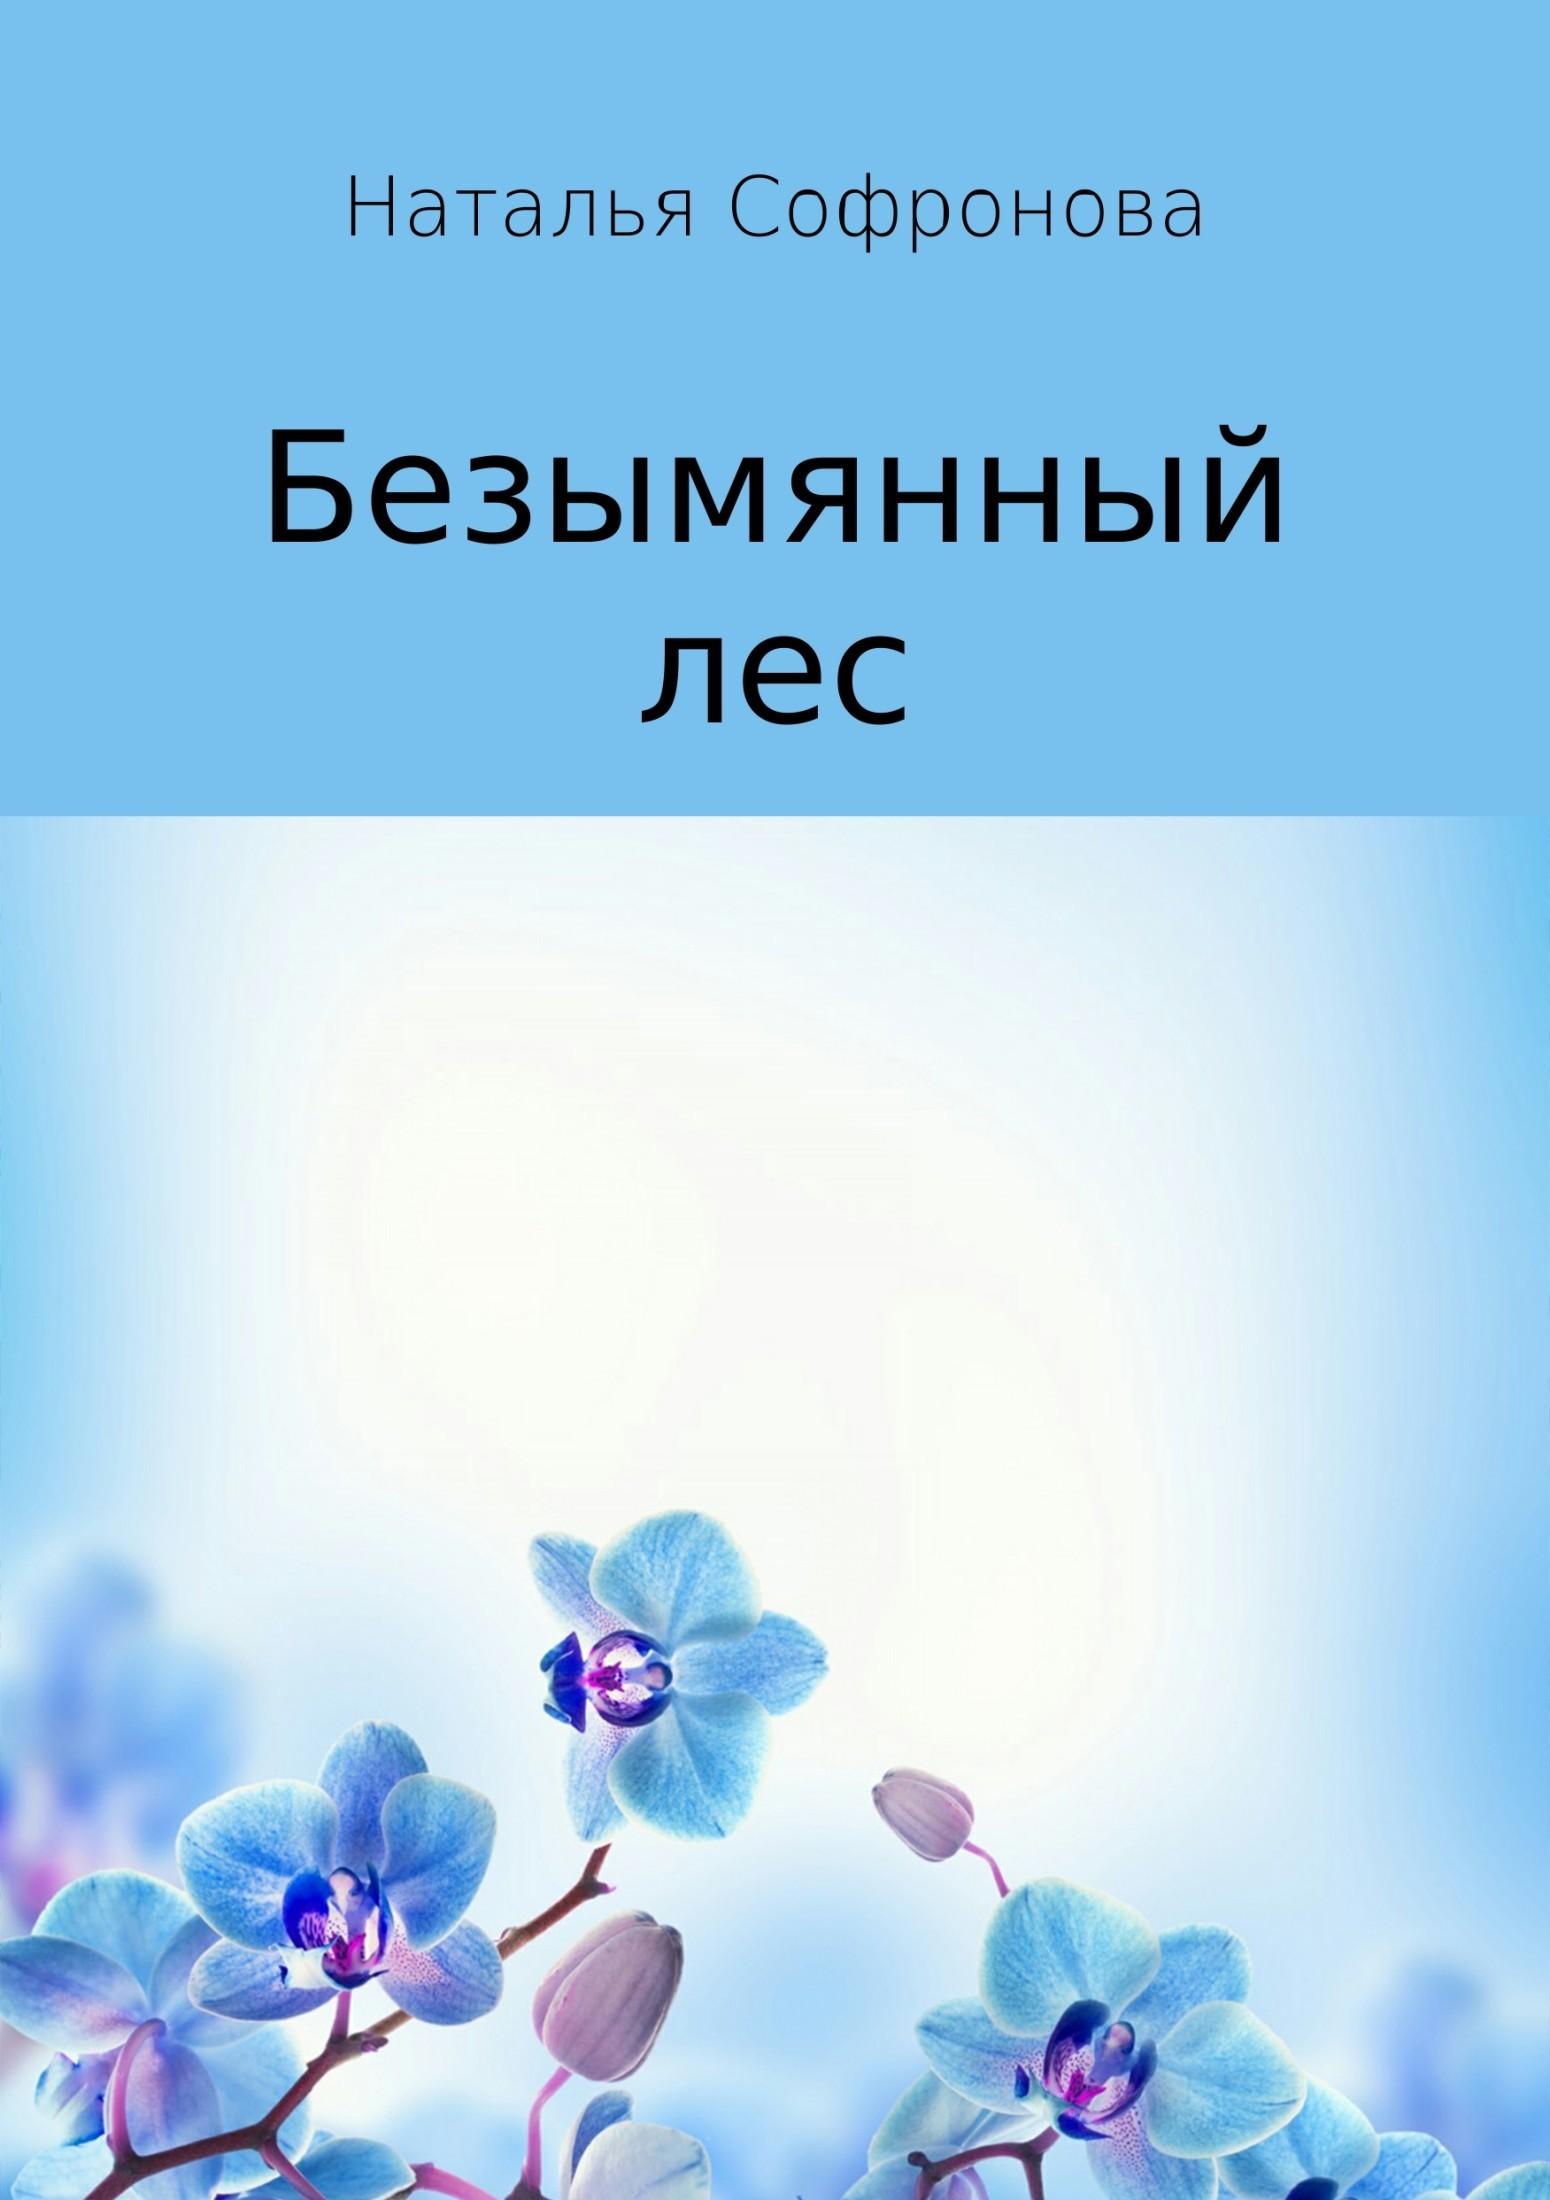 Наталья Вячеславовна Софронова Безымянный лес цена и фото